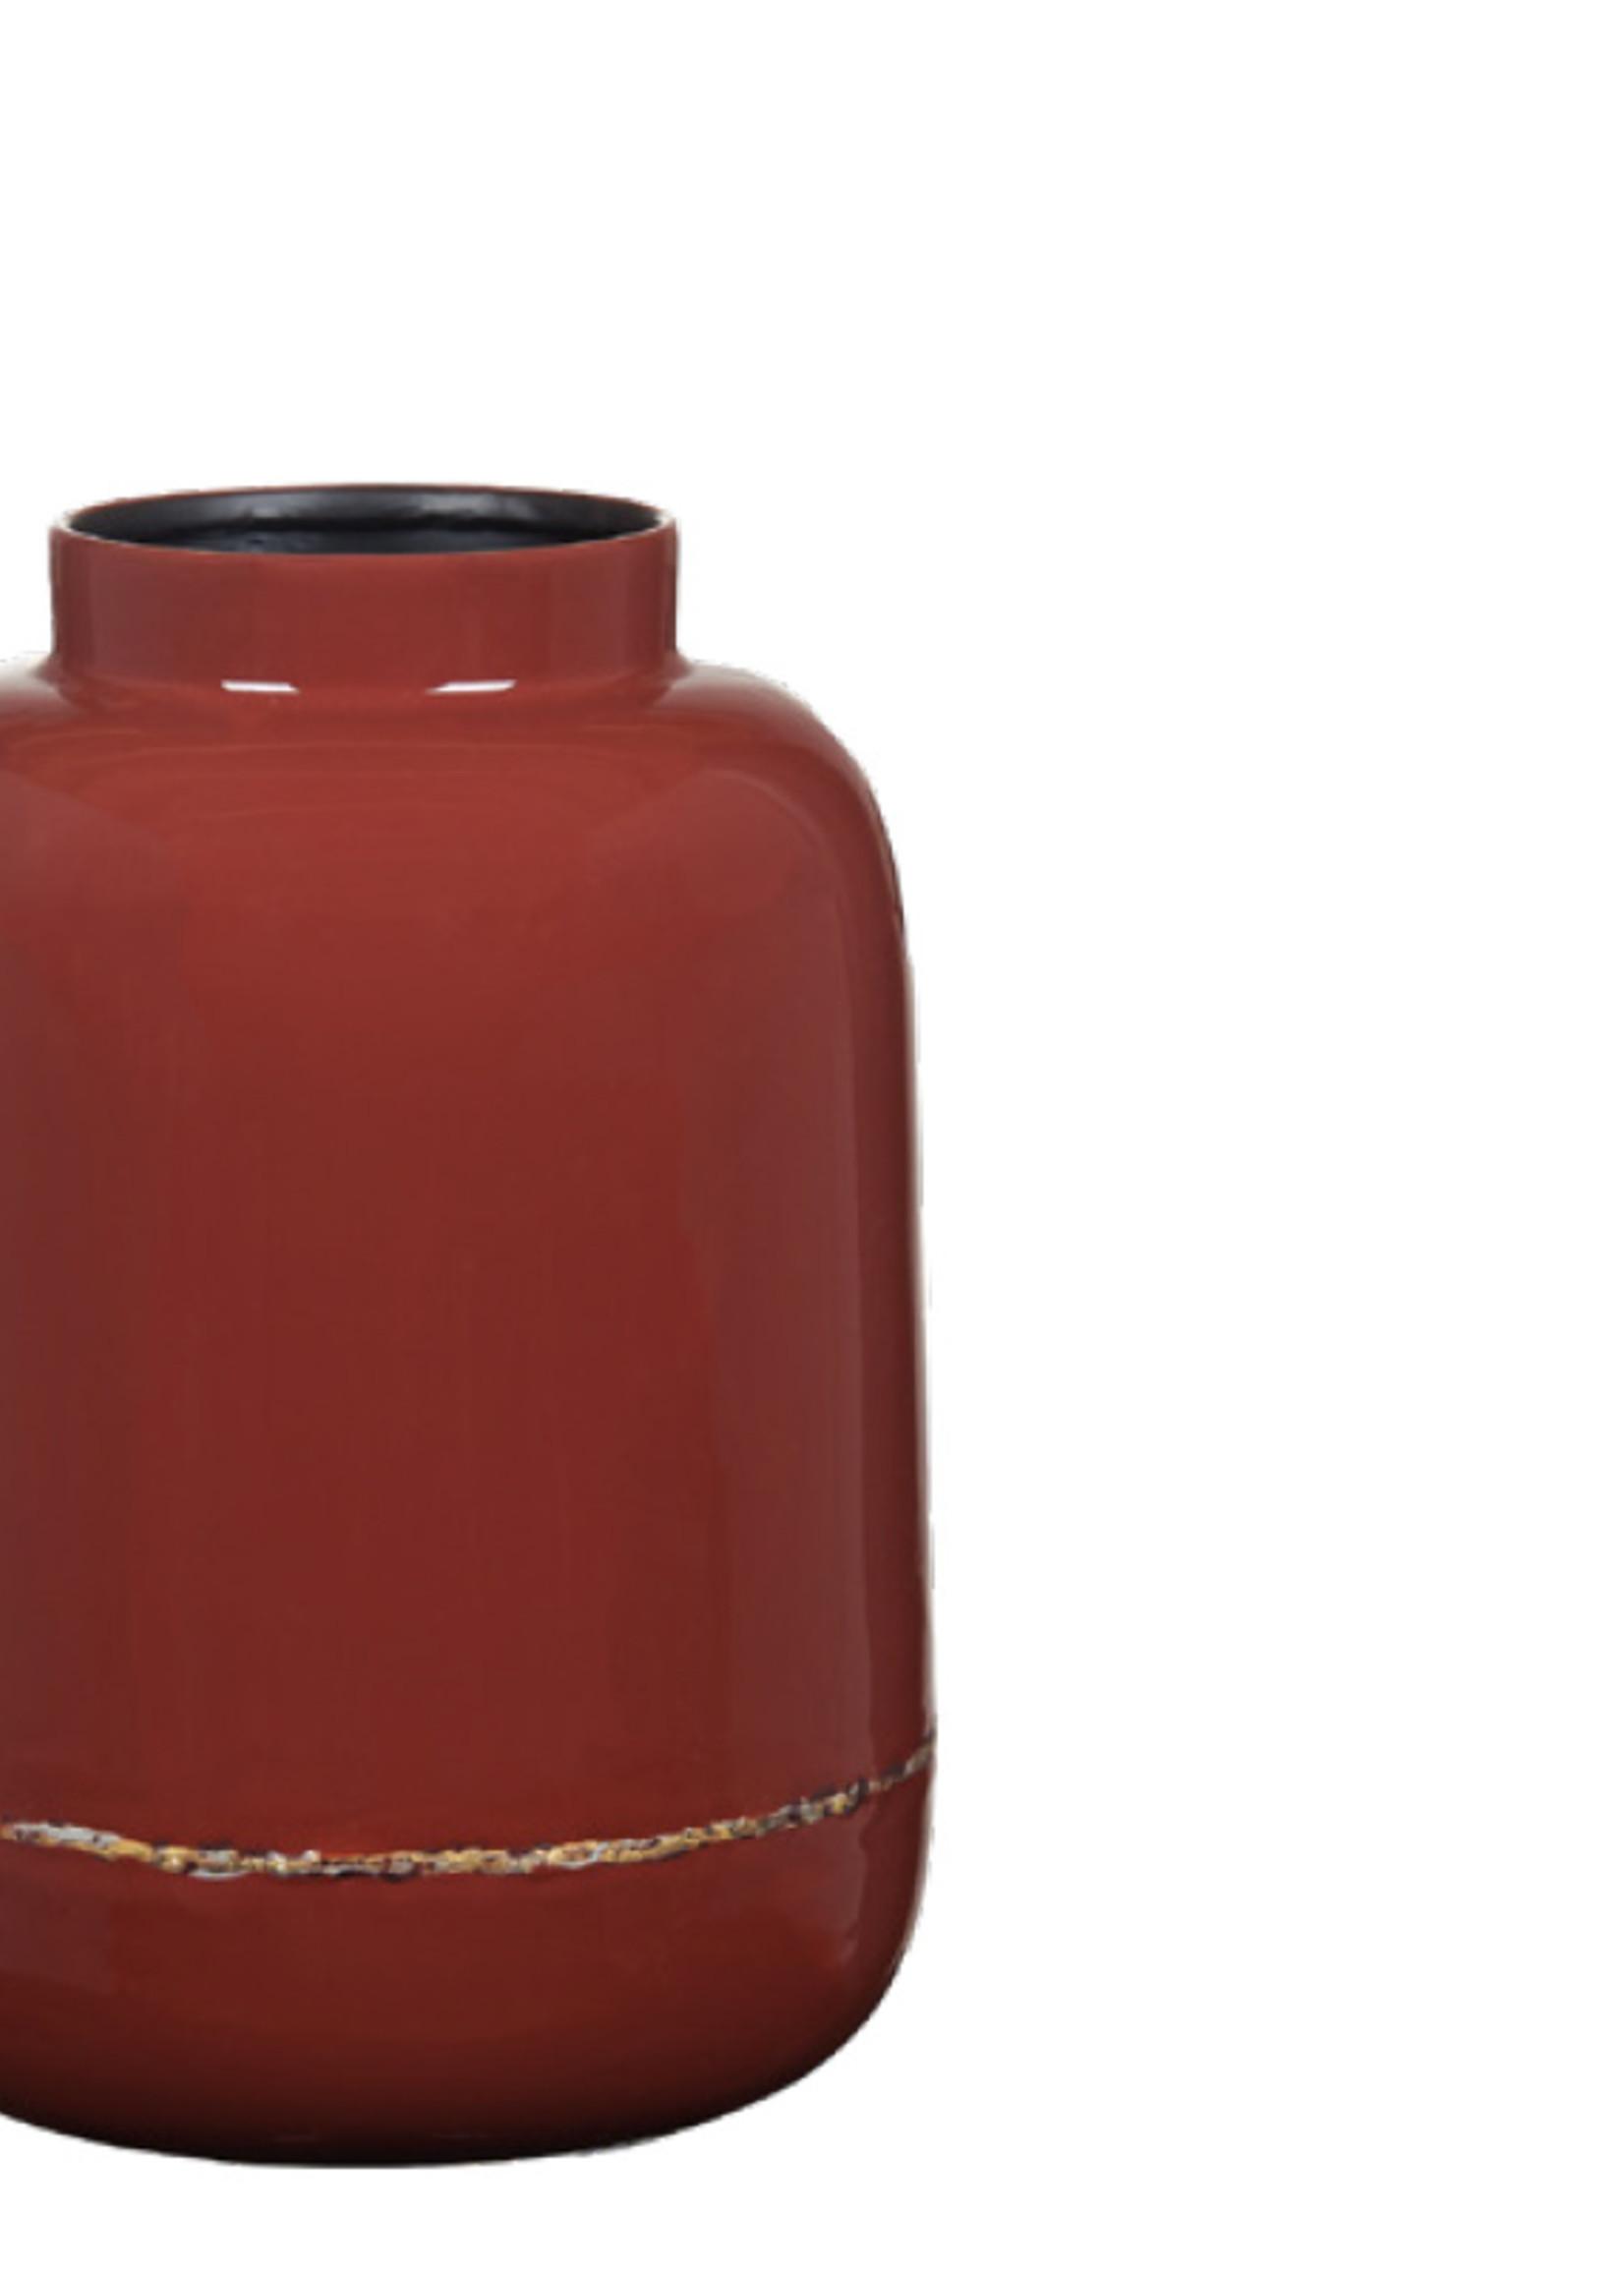 Lifestyle Maiya vase earth red M